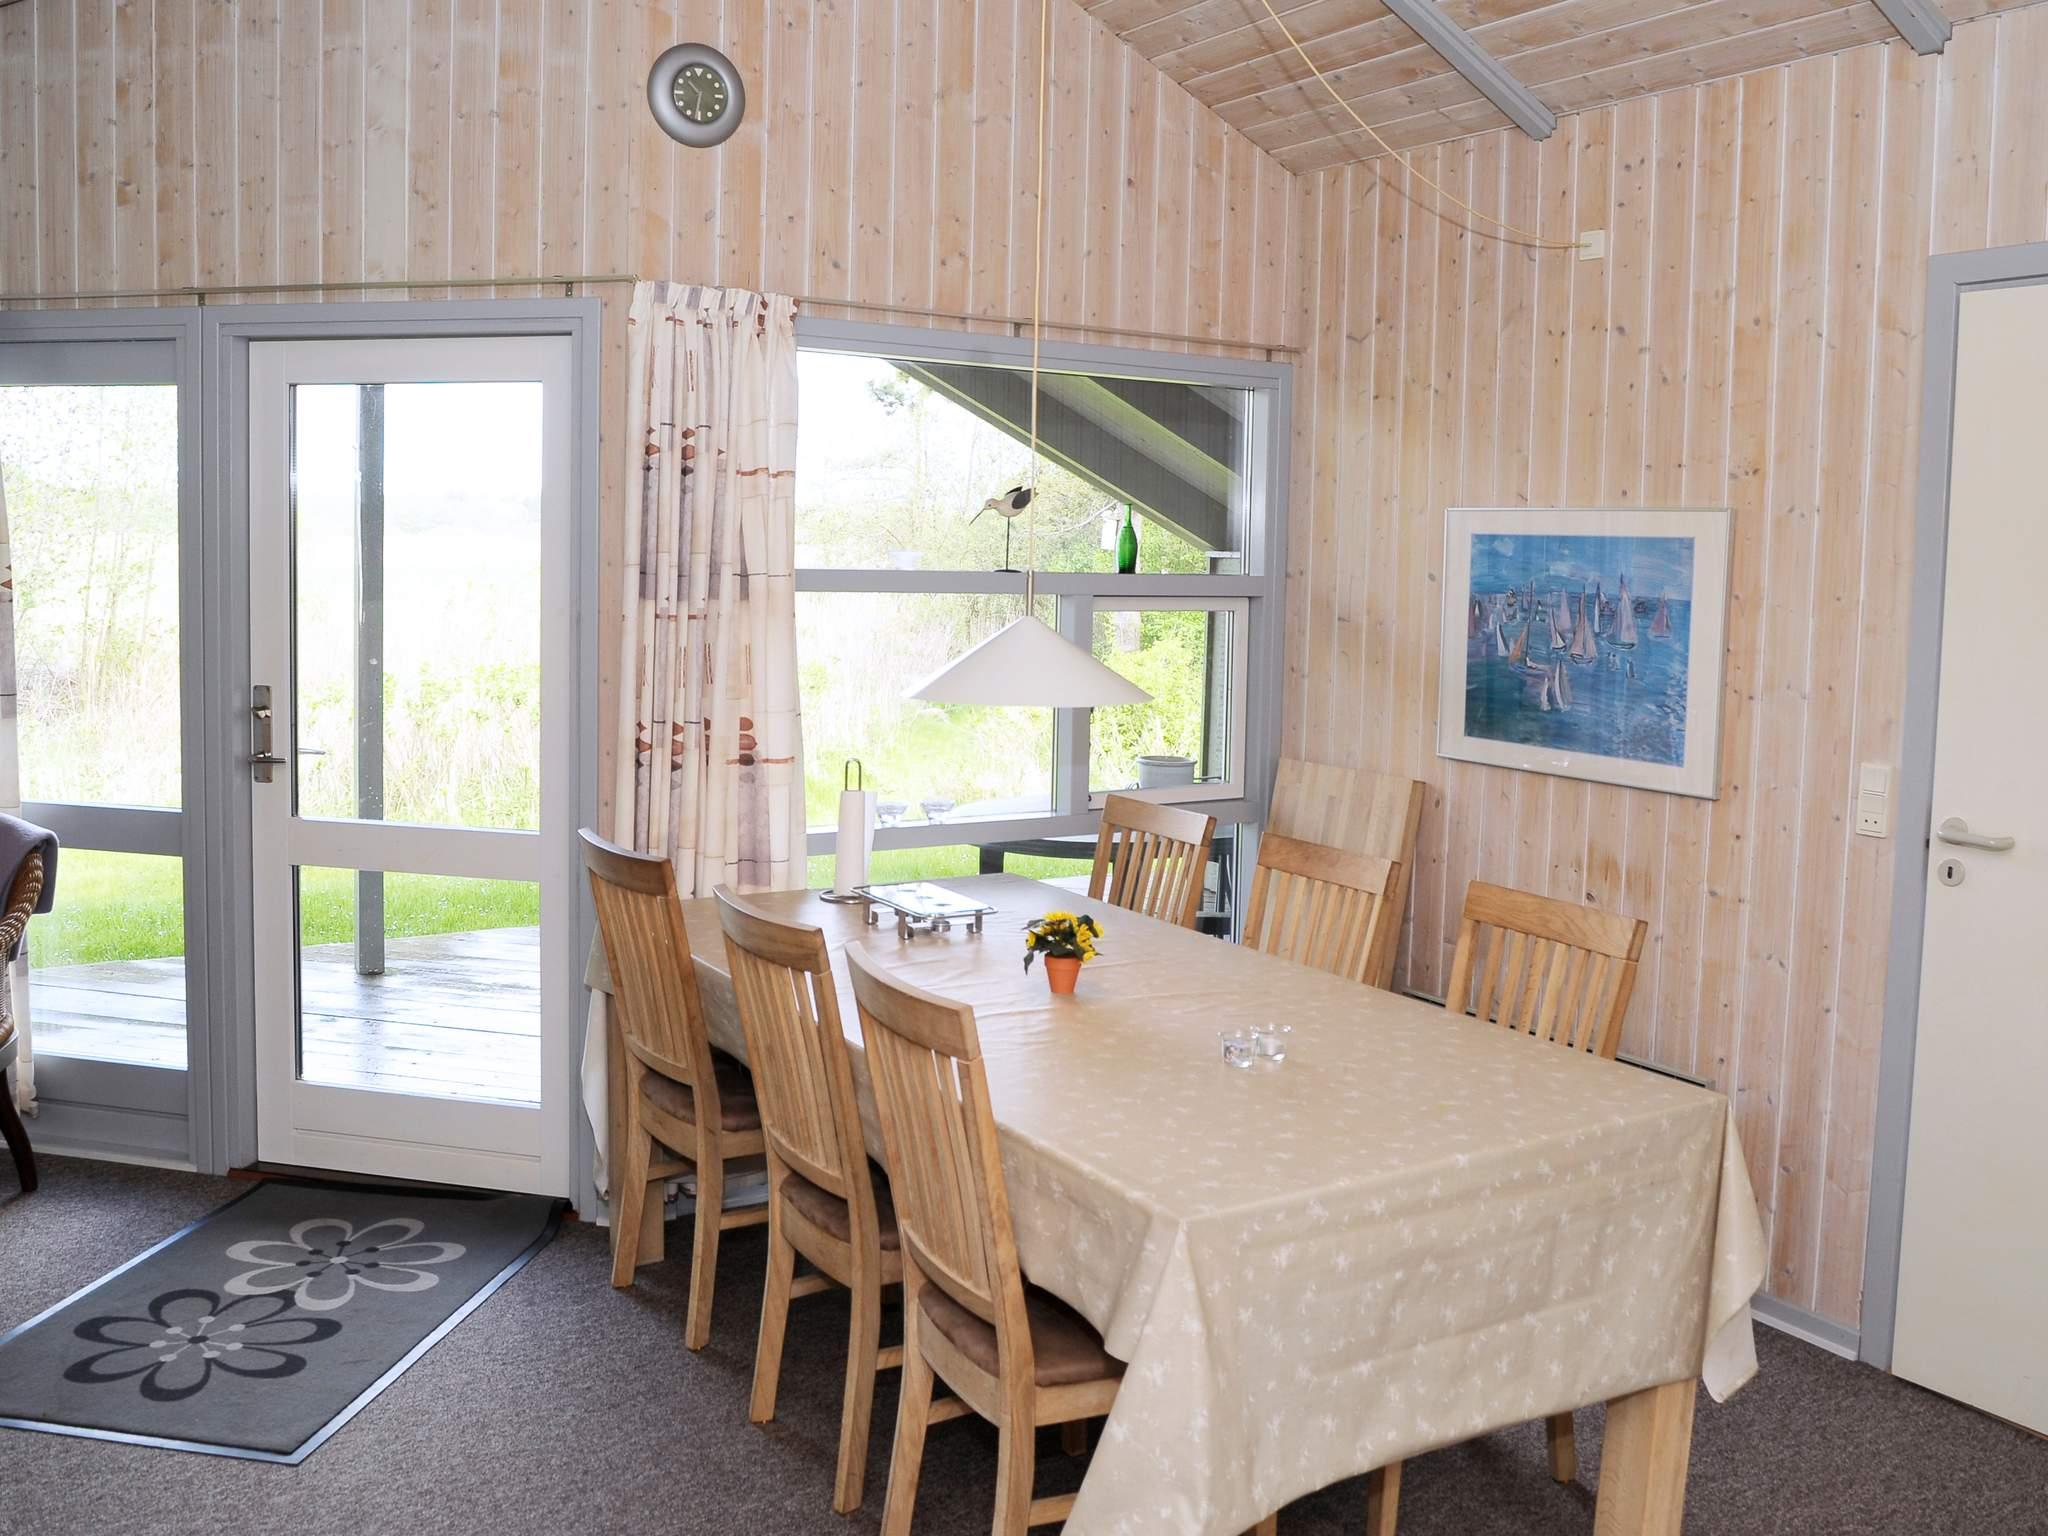 Ferienhaus Ristinge (93203), Ristinge, , Langeland, Dänemark, Bild 19